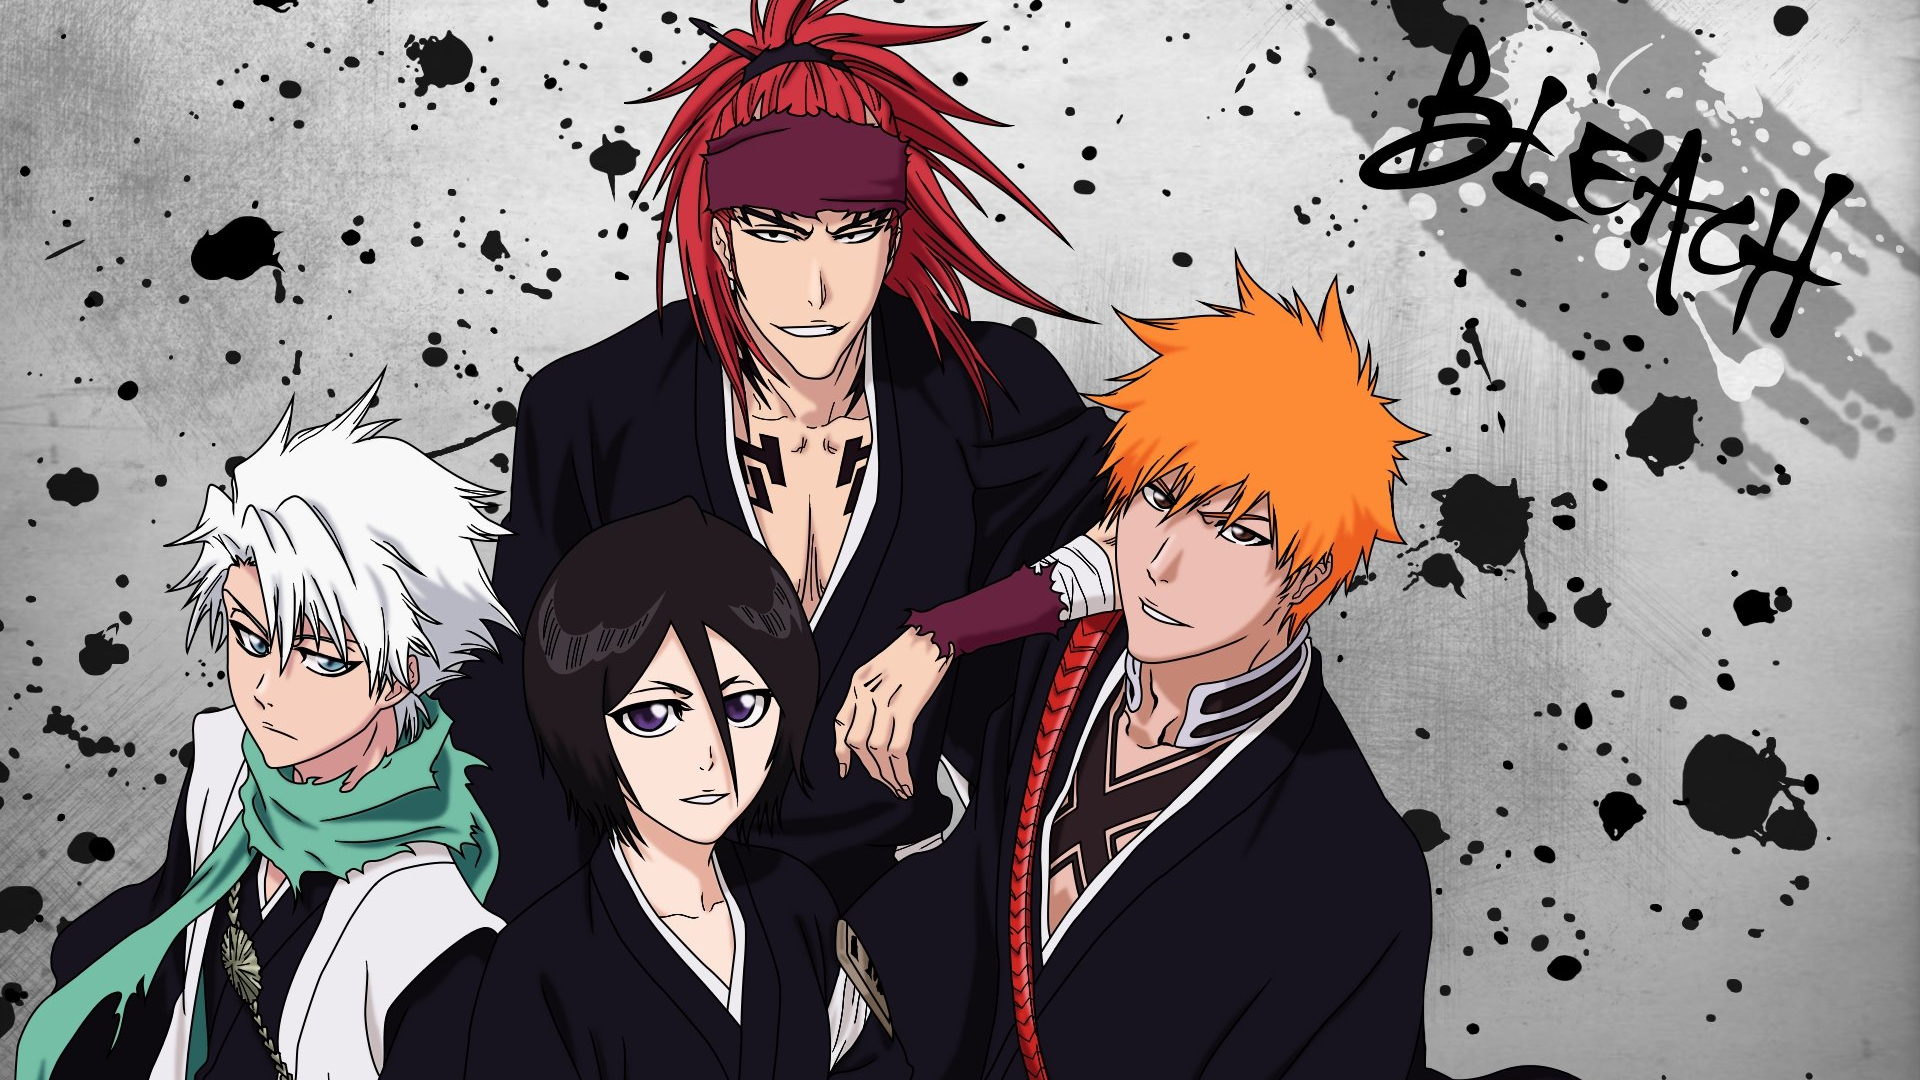 Free download Bleach Characters Bleach